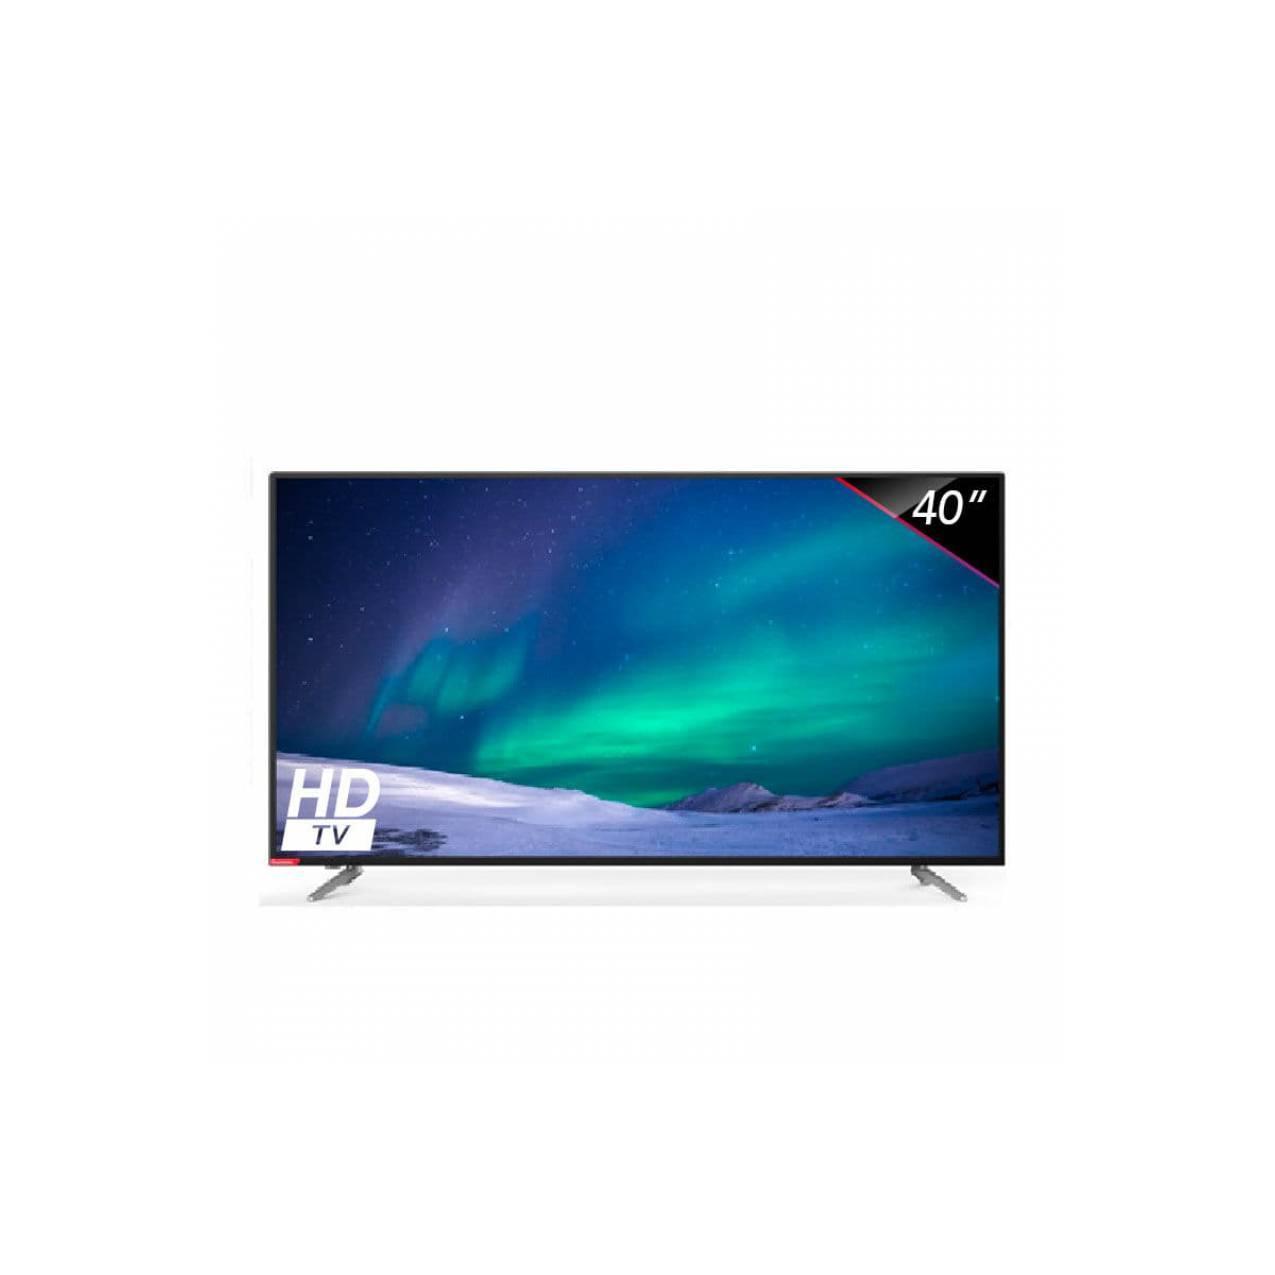 CHANGHONG LED TV 40 inch - 40E6000